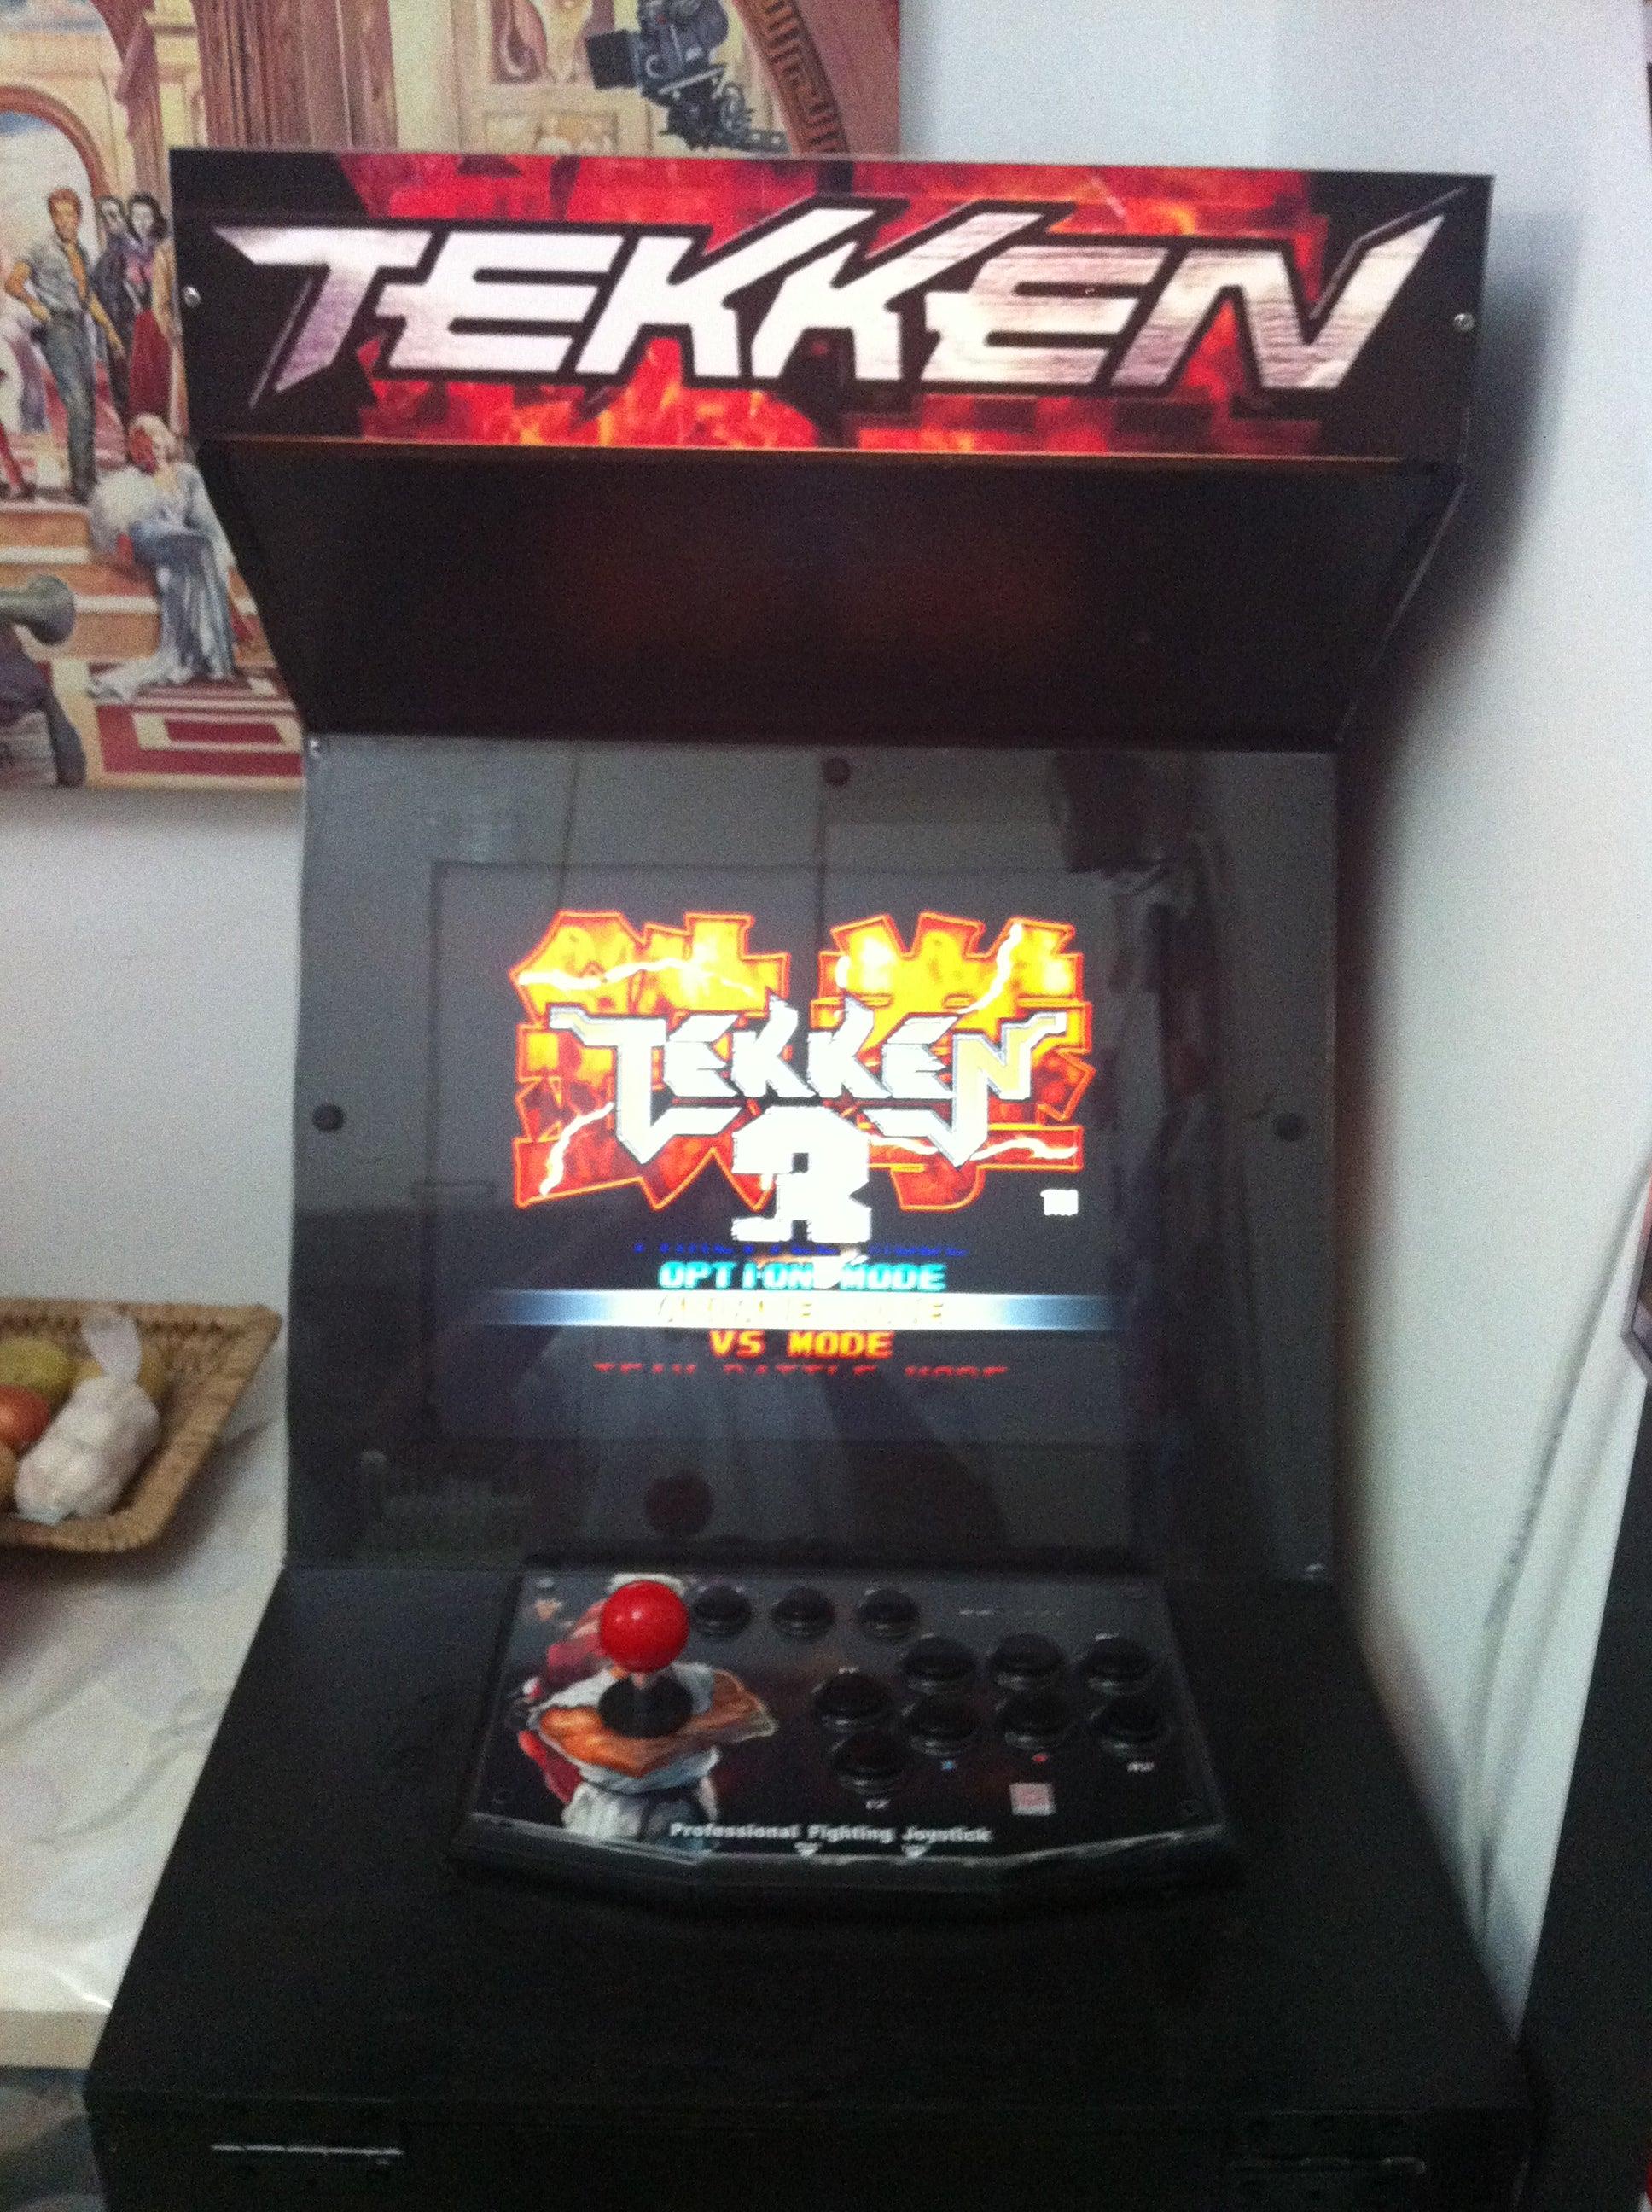 Intro Diy Tekken 3 Arcade Macine 23 Steps Instructables